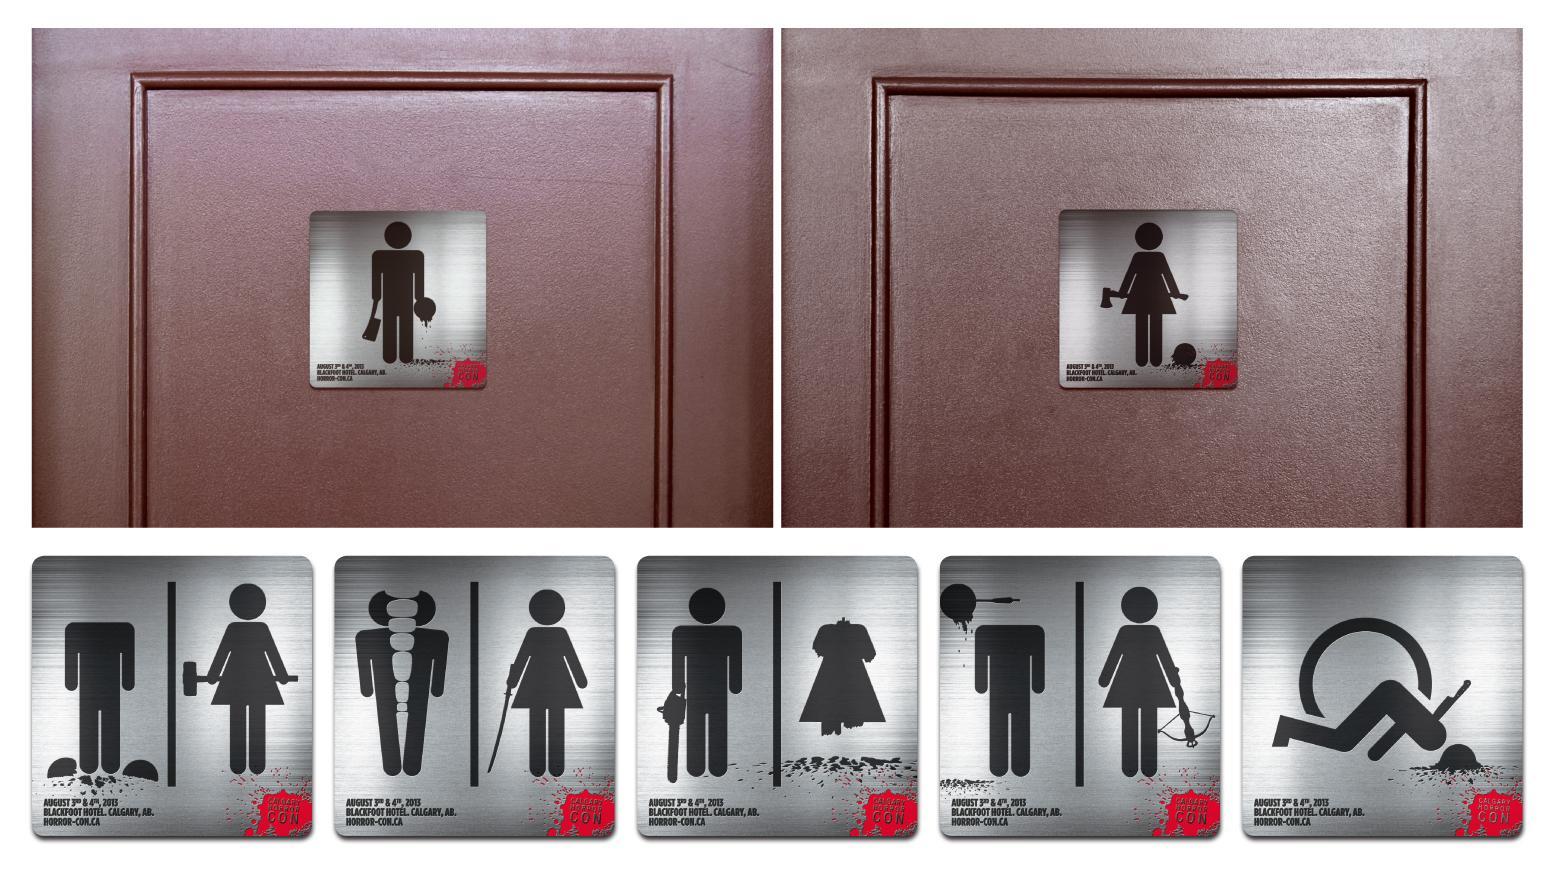 Calgary Horror Convention Ambient Ad -  Bathroom sticker